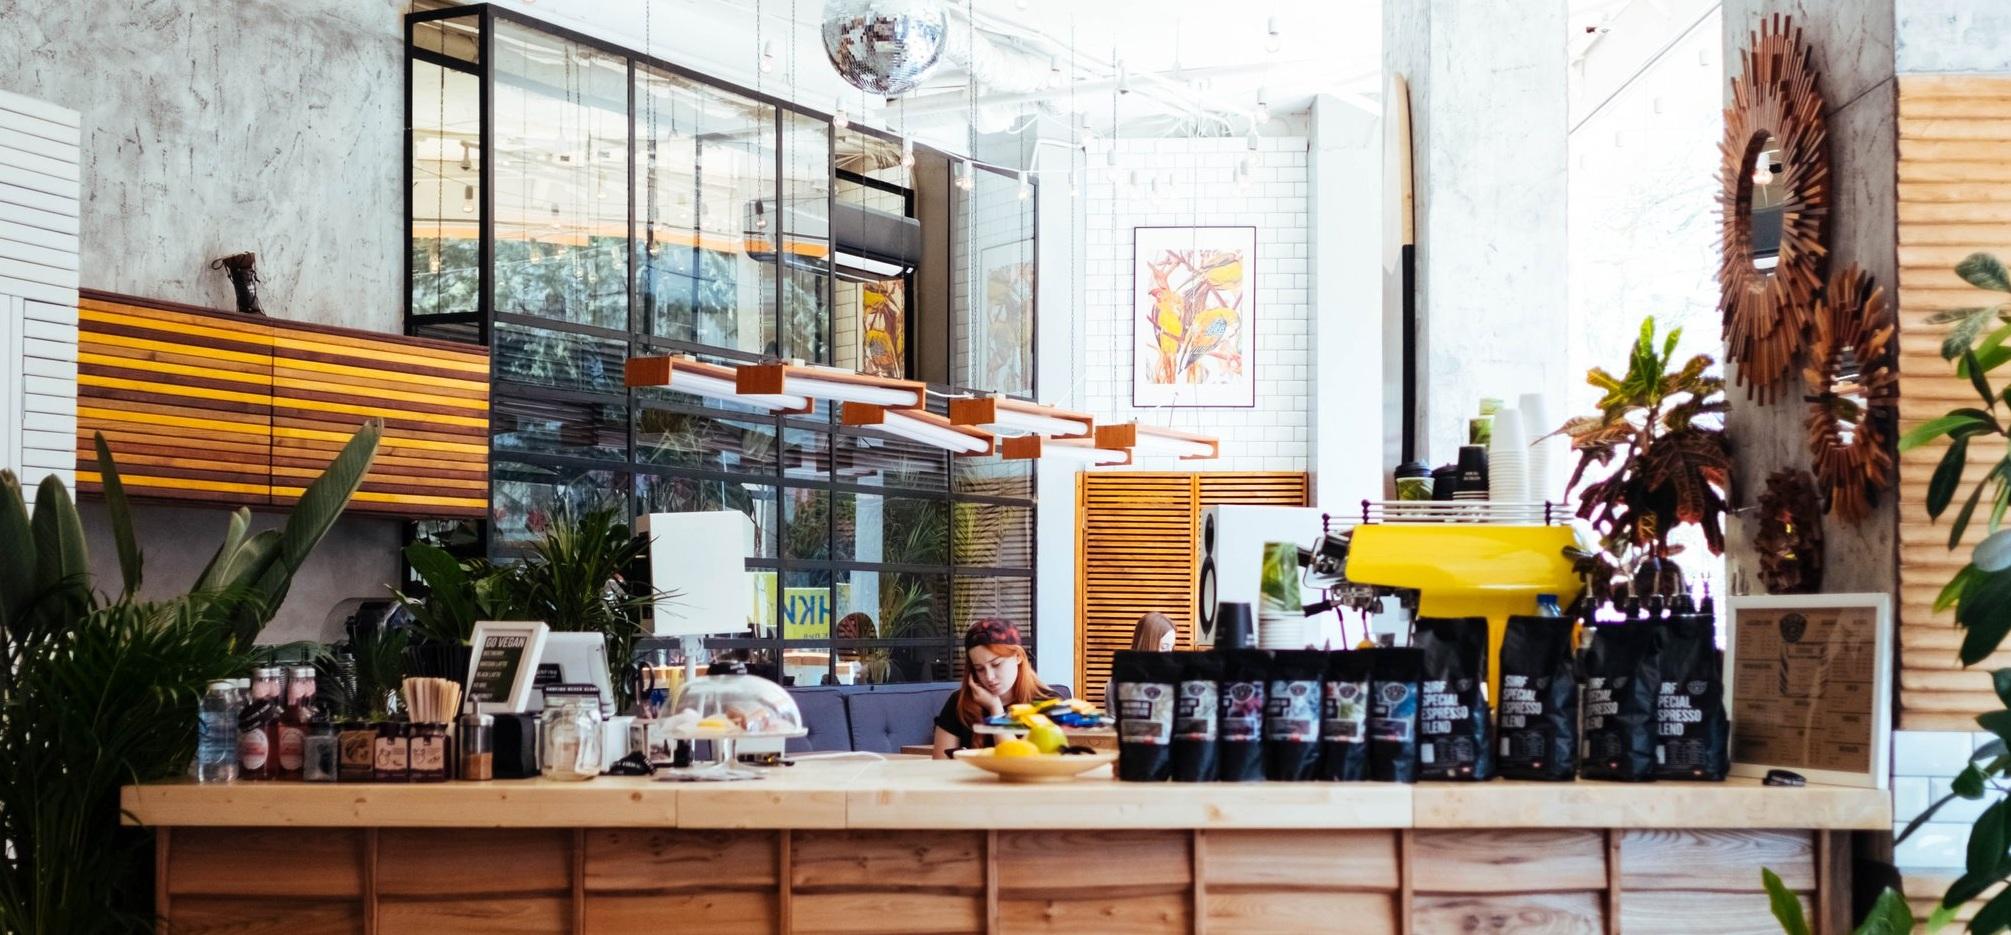 bar-caffeine-coffee-1002740.jpg